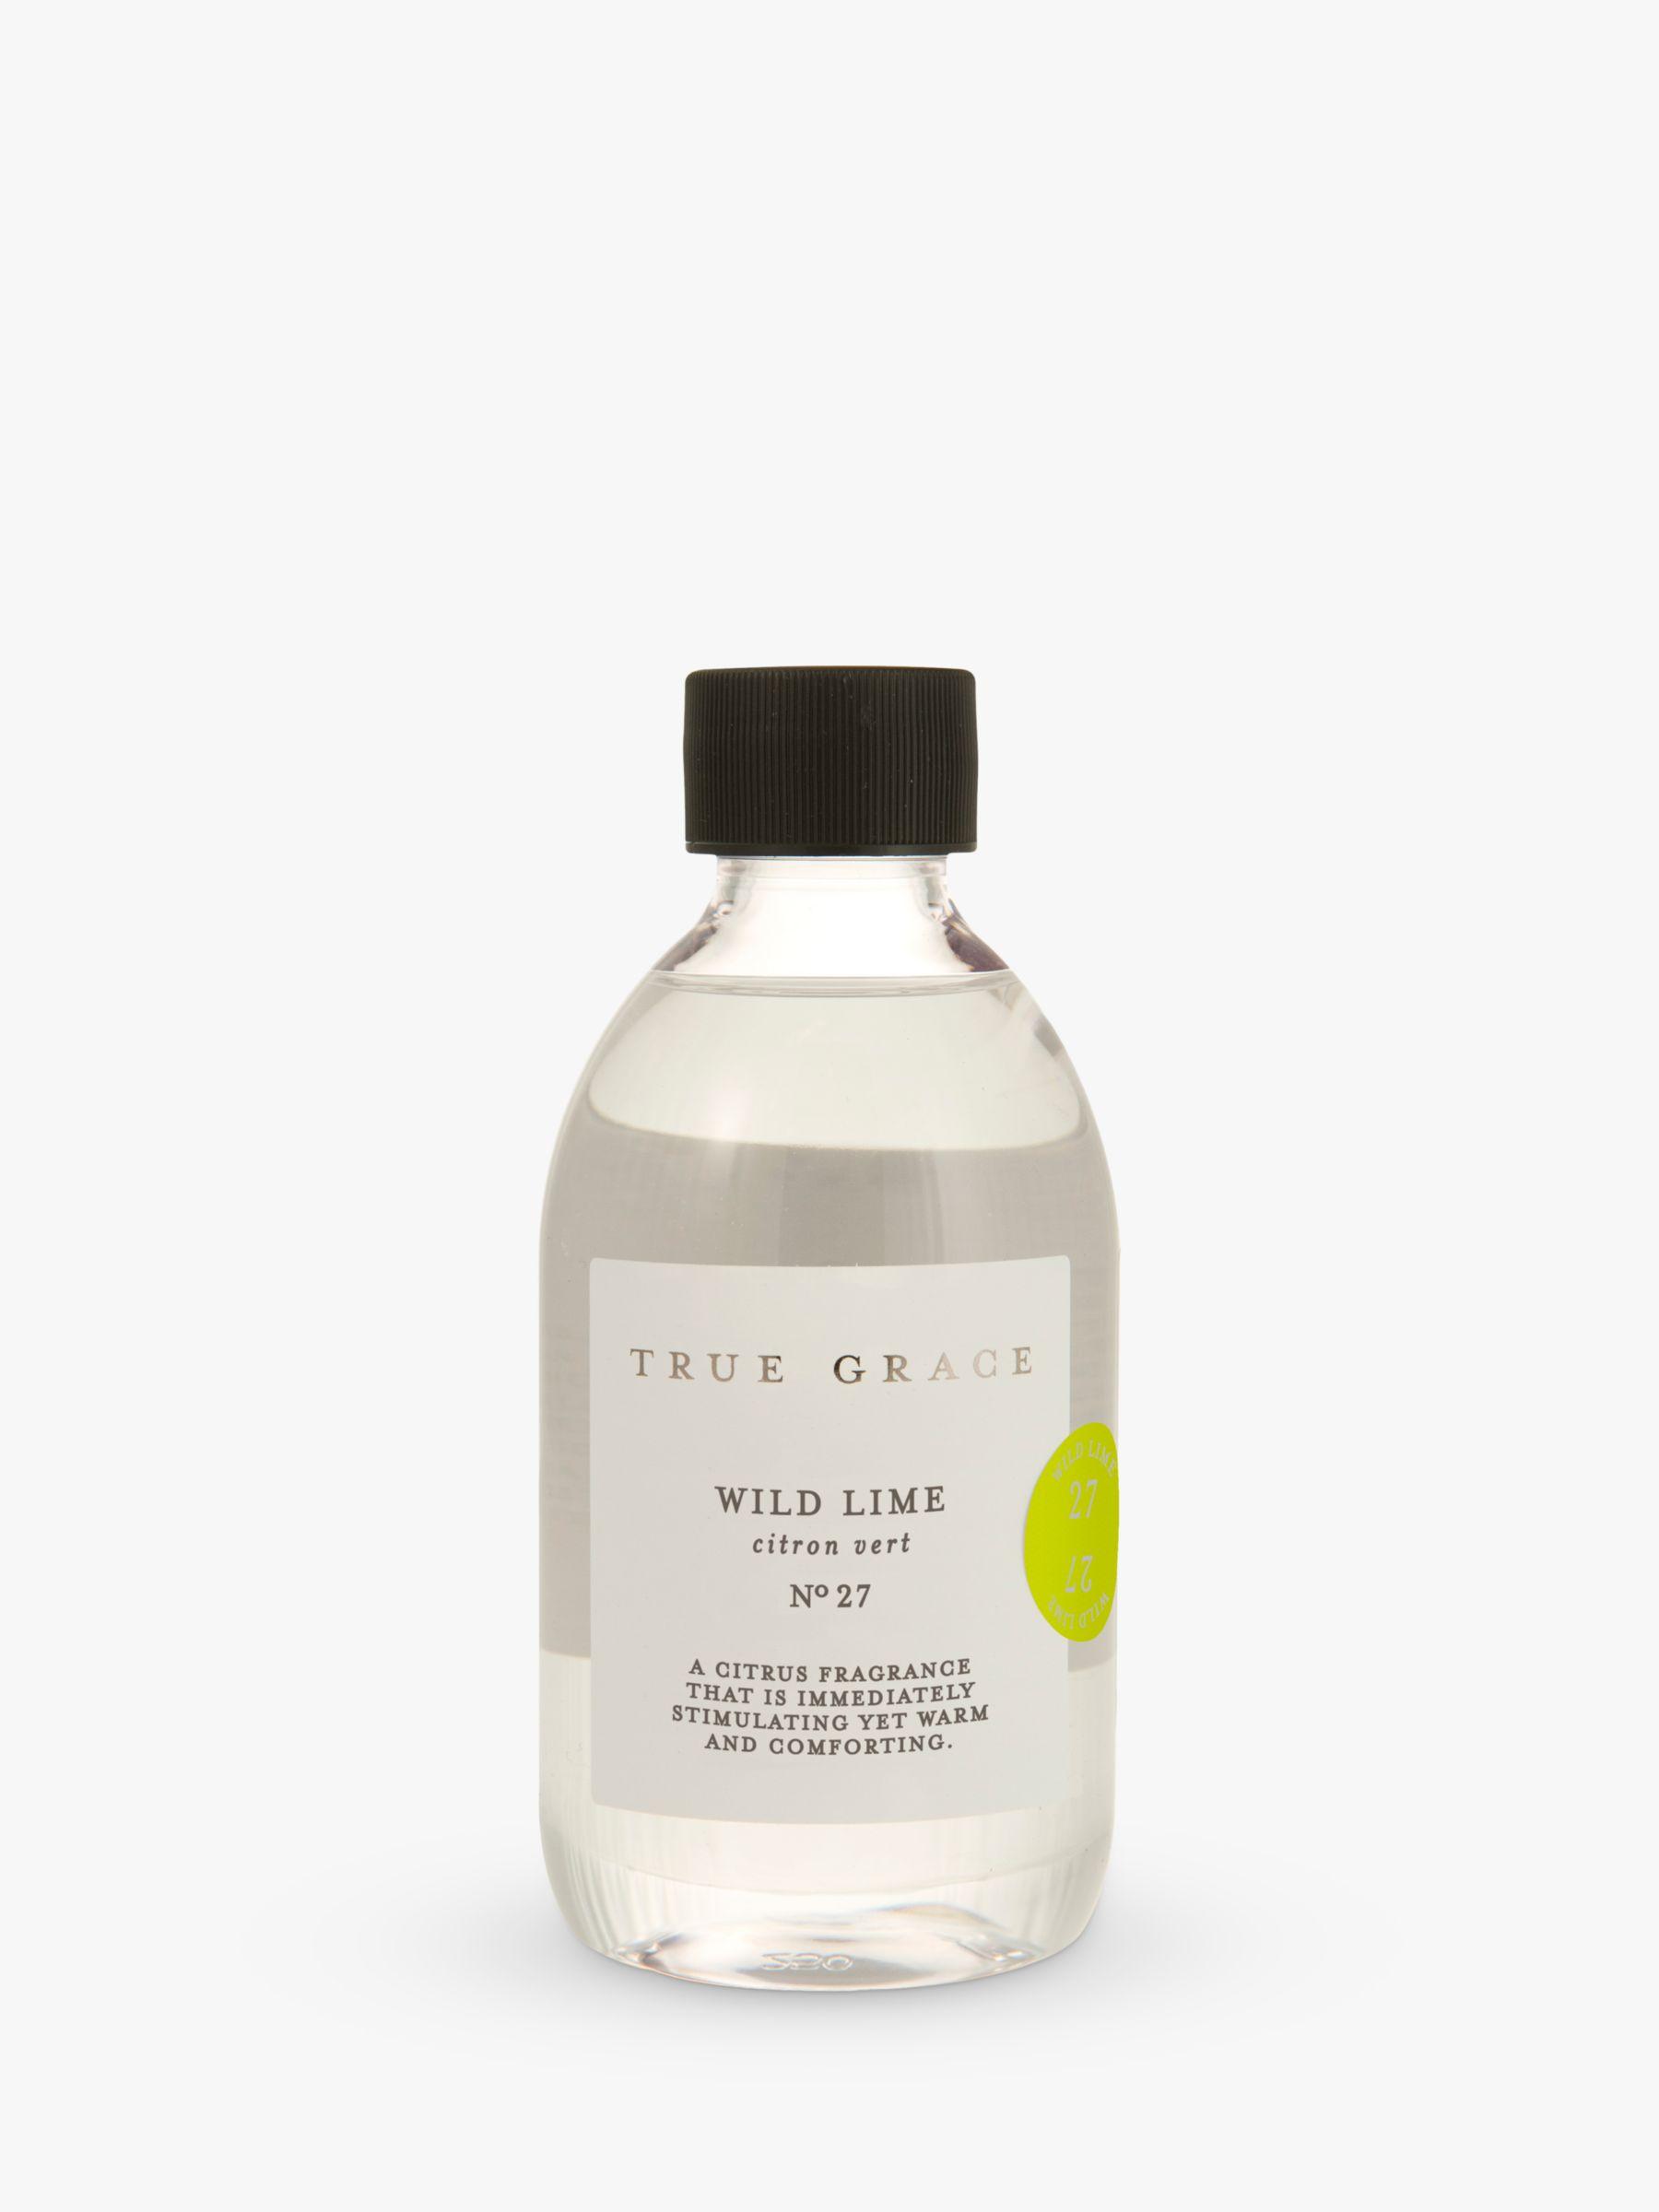 True Grace True Grace Wild Lime Diffuser Refill, 250ml